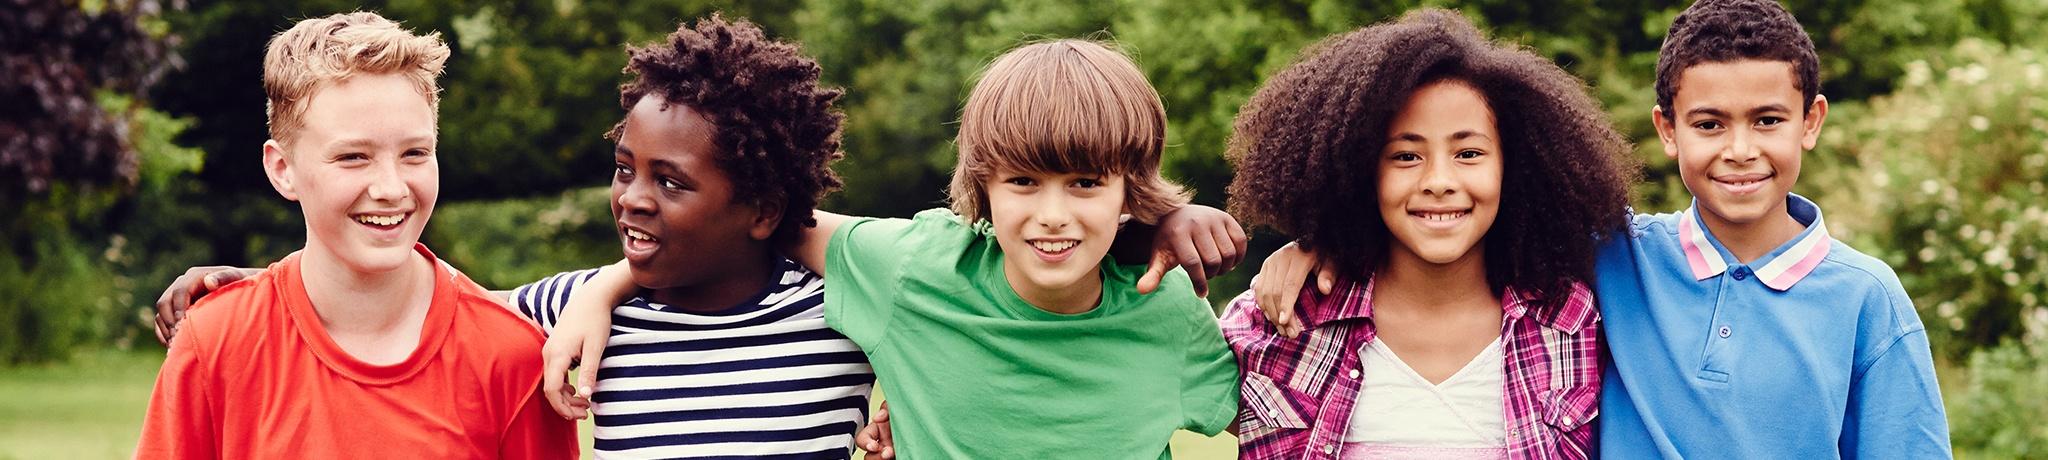 Pediatric Behavioral Health and Development